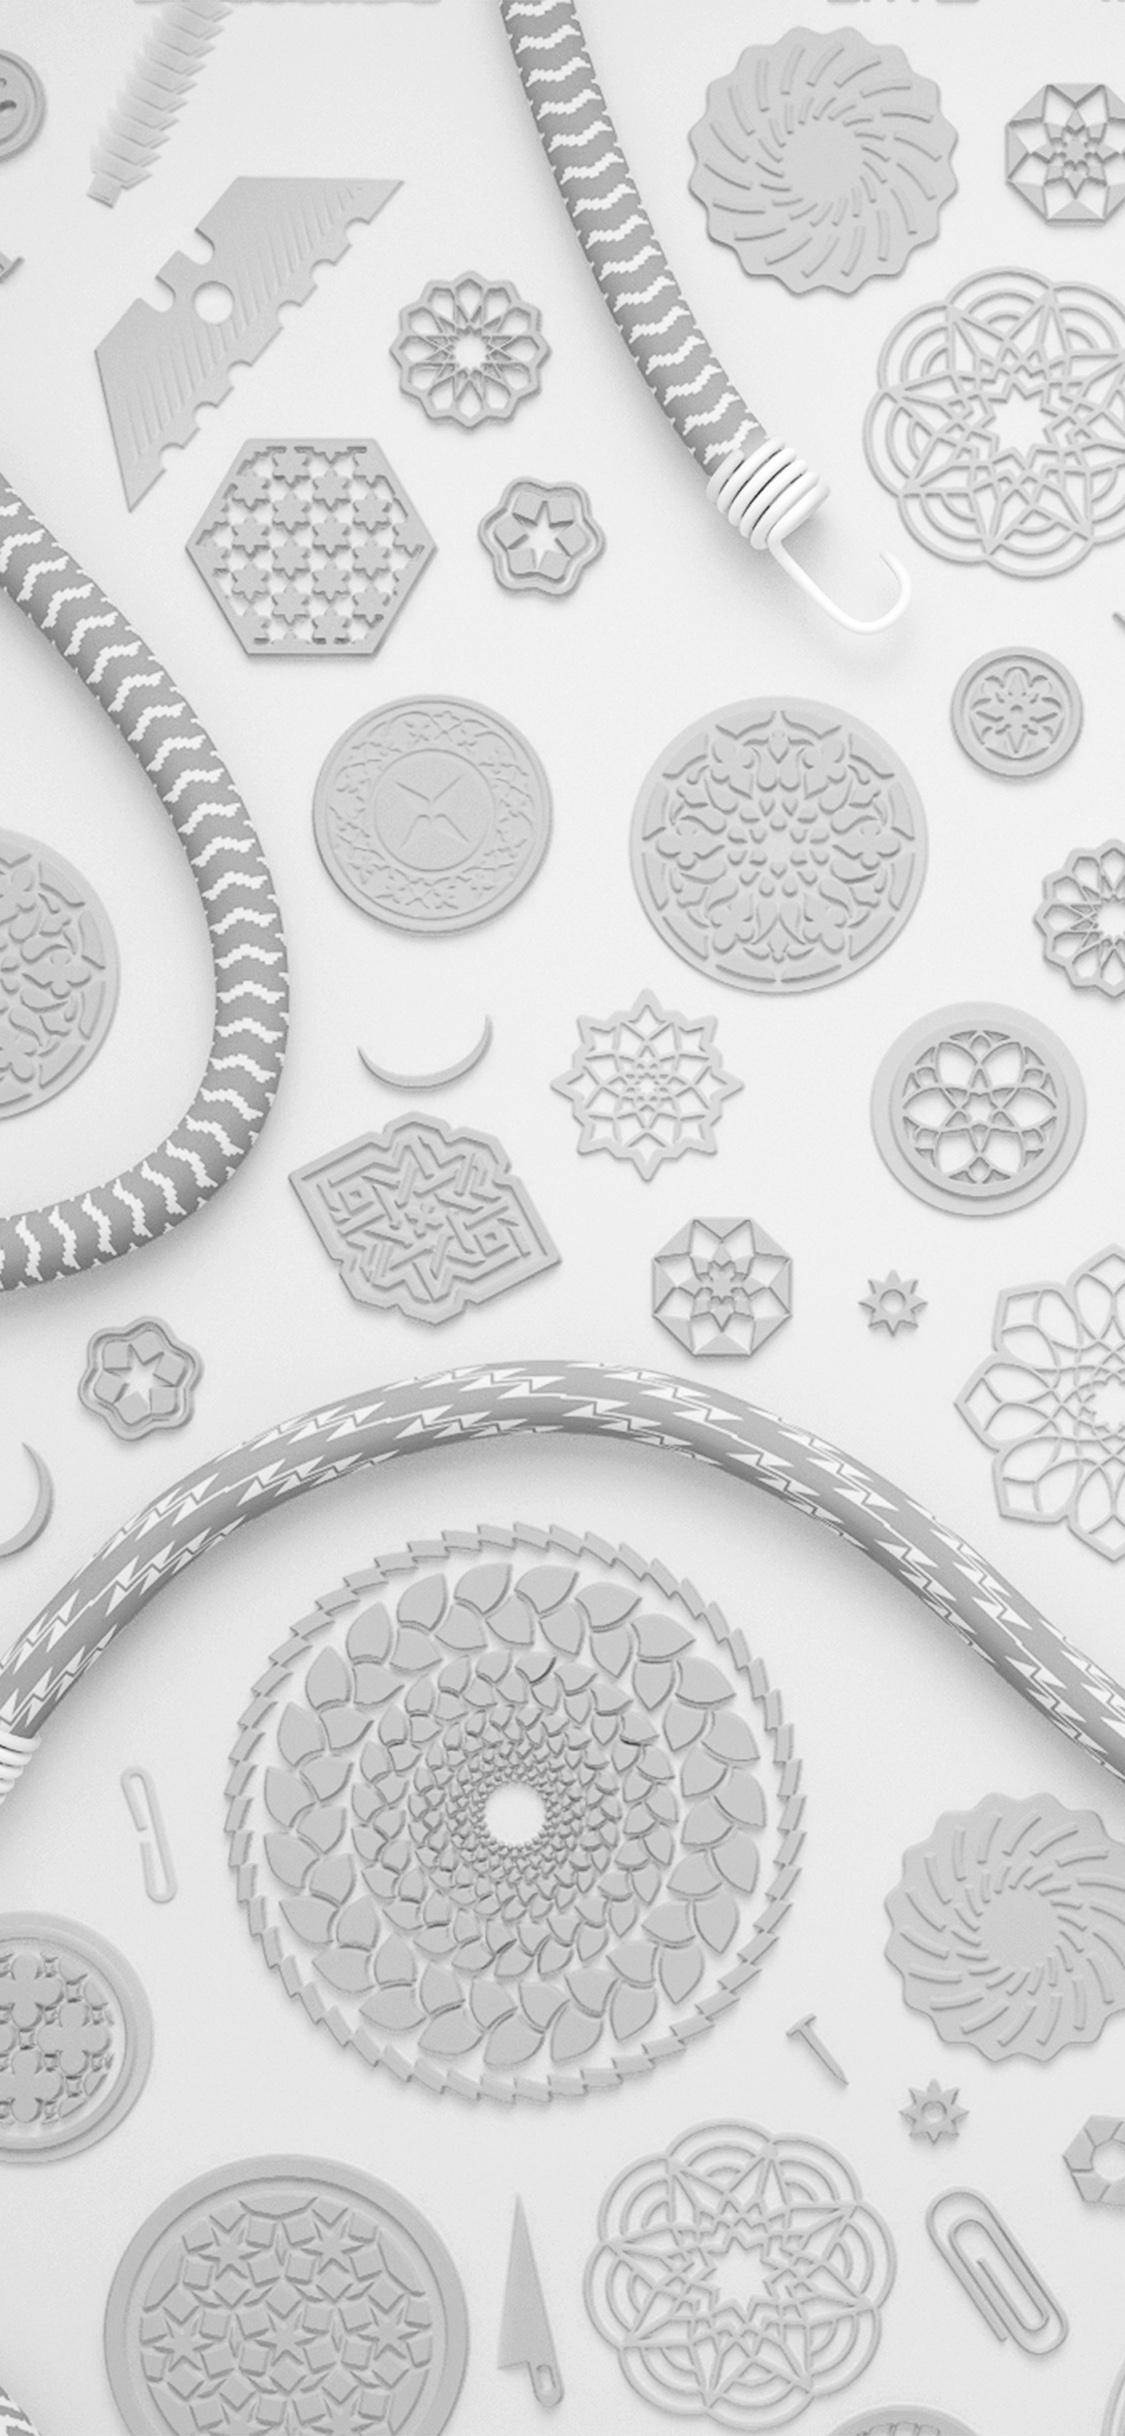 iPhoneXpapers.com-Apple-iPhone-wallpaper-at97-dan-funderburgh-simple-pattern-art-illustration-bw-white